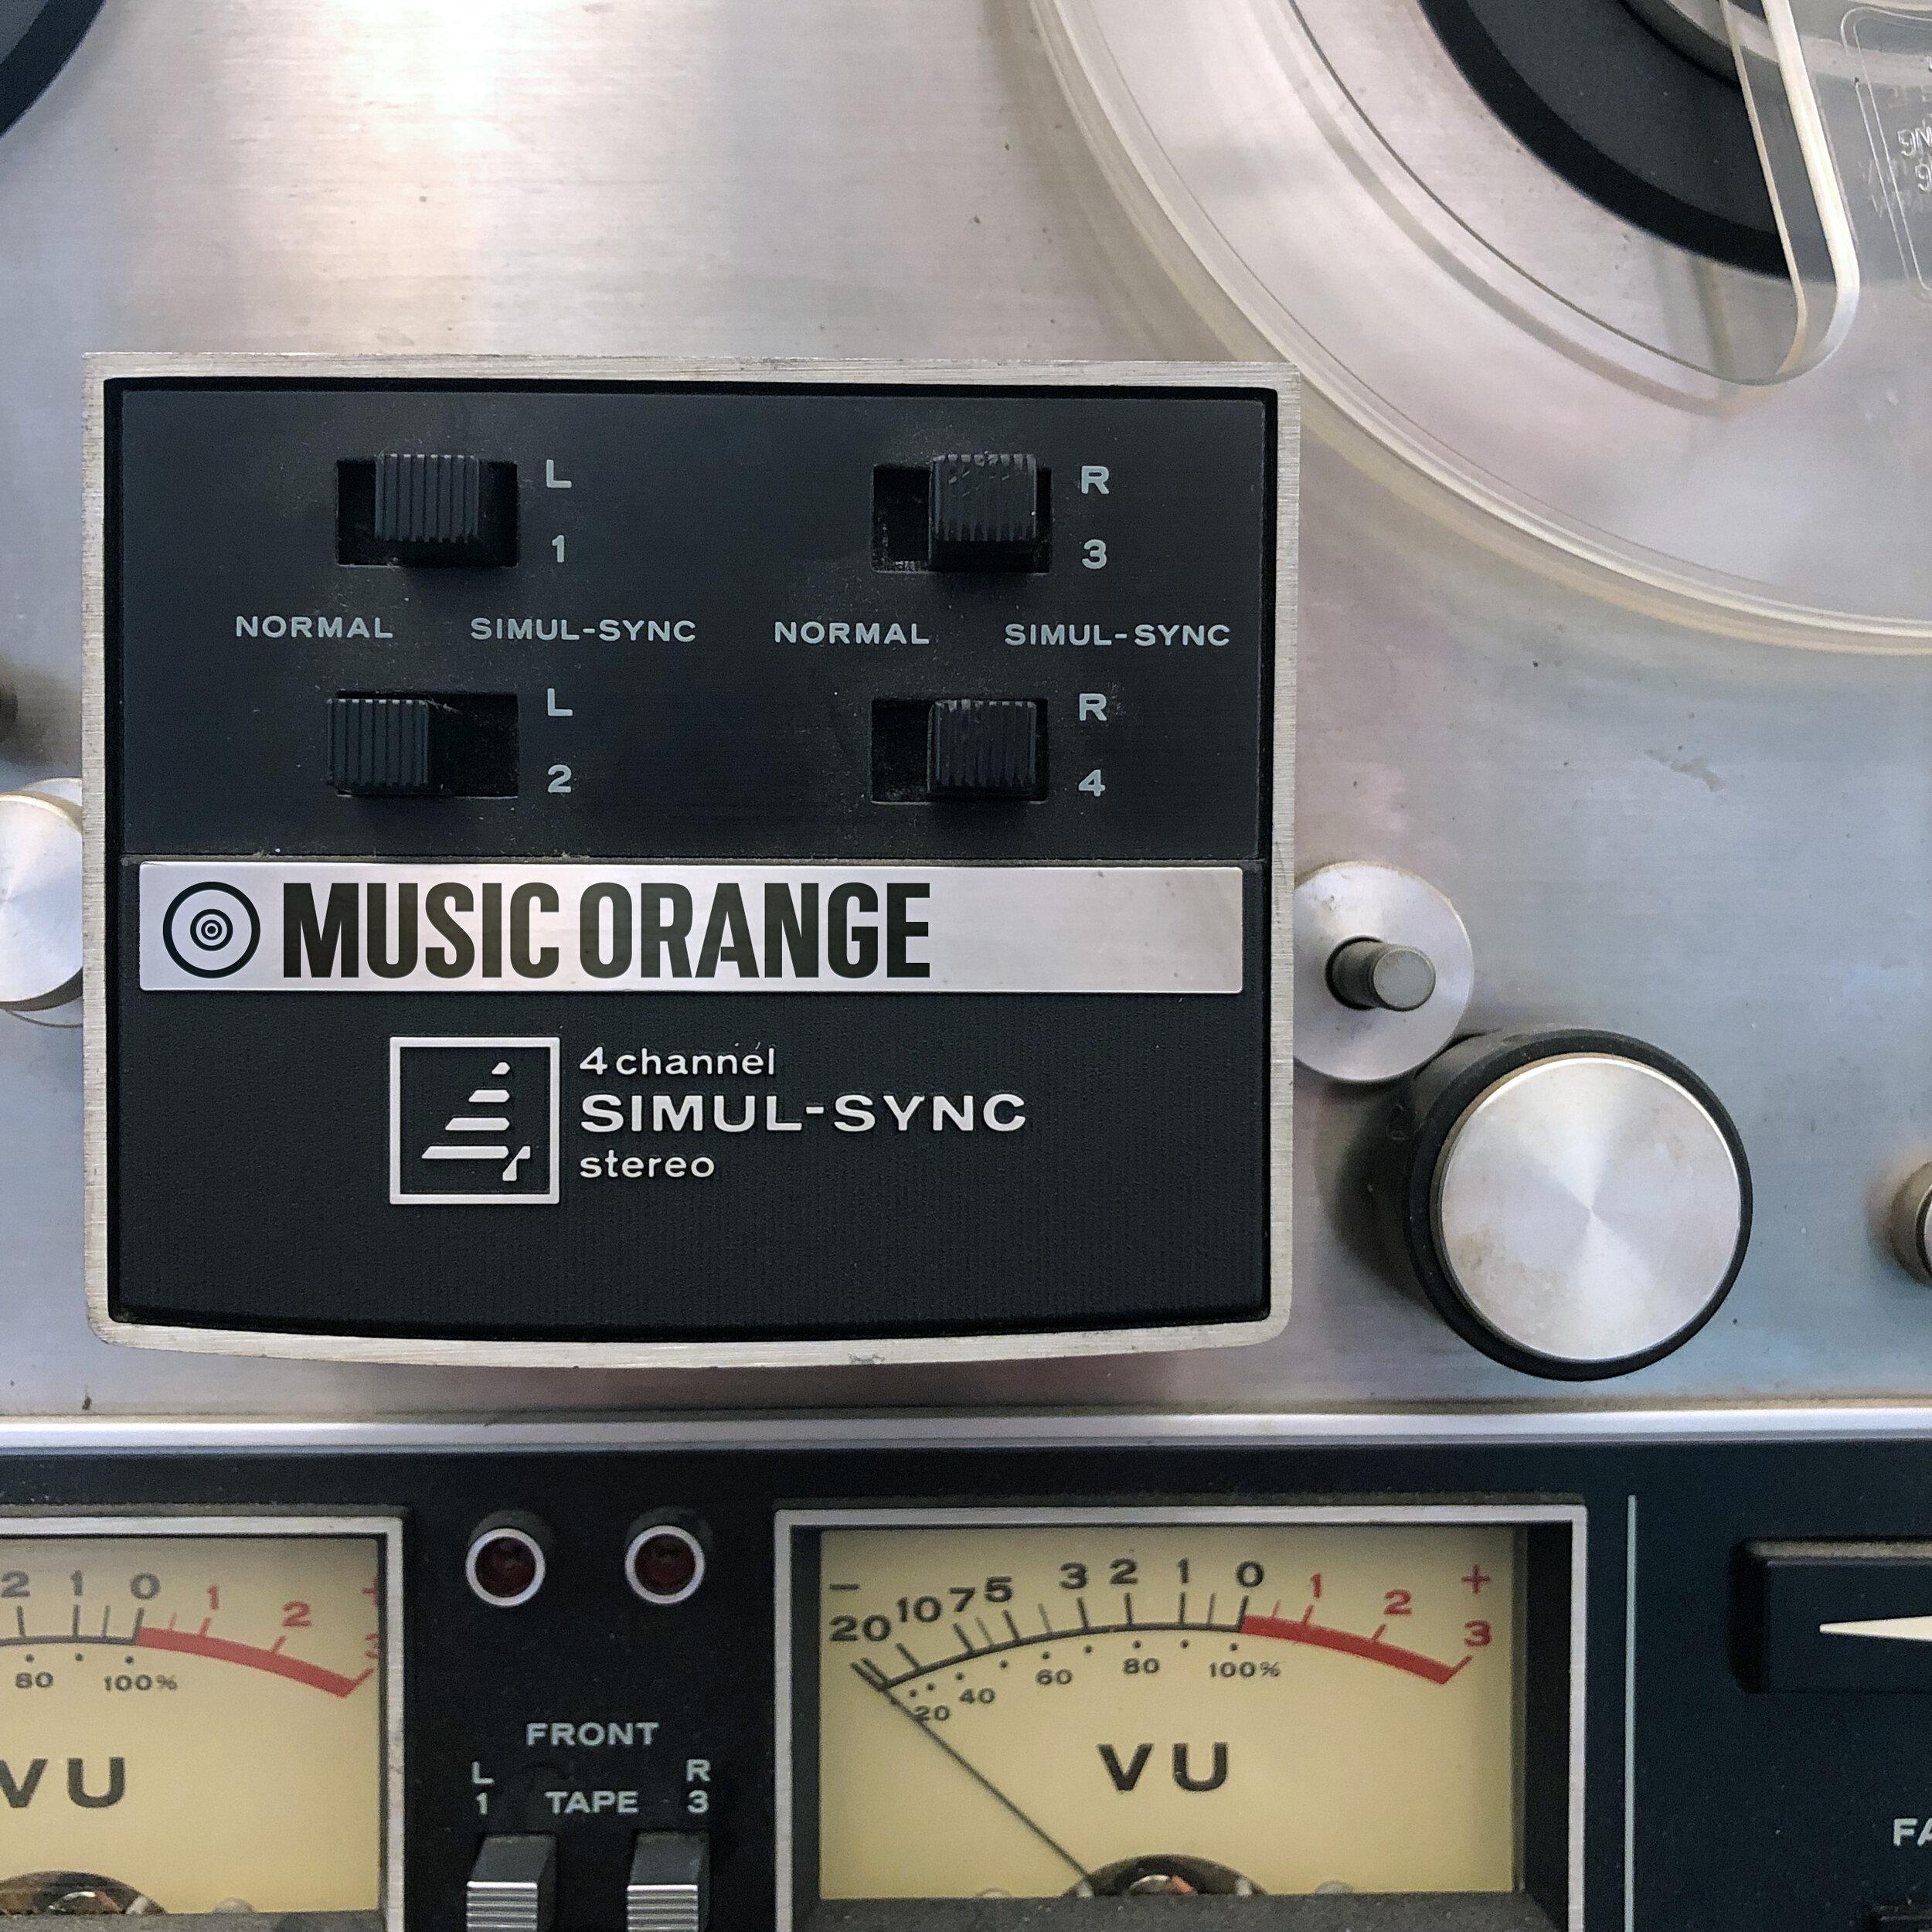 music-orange-simul-sync.jpg